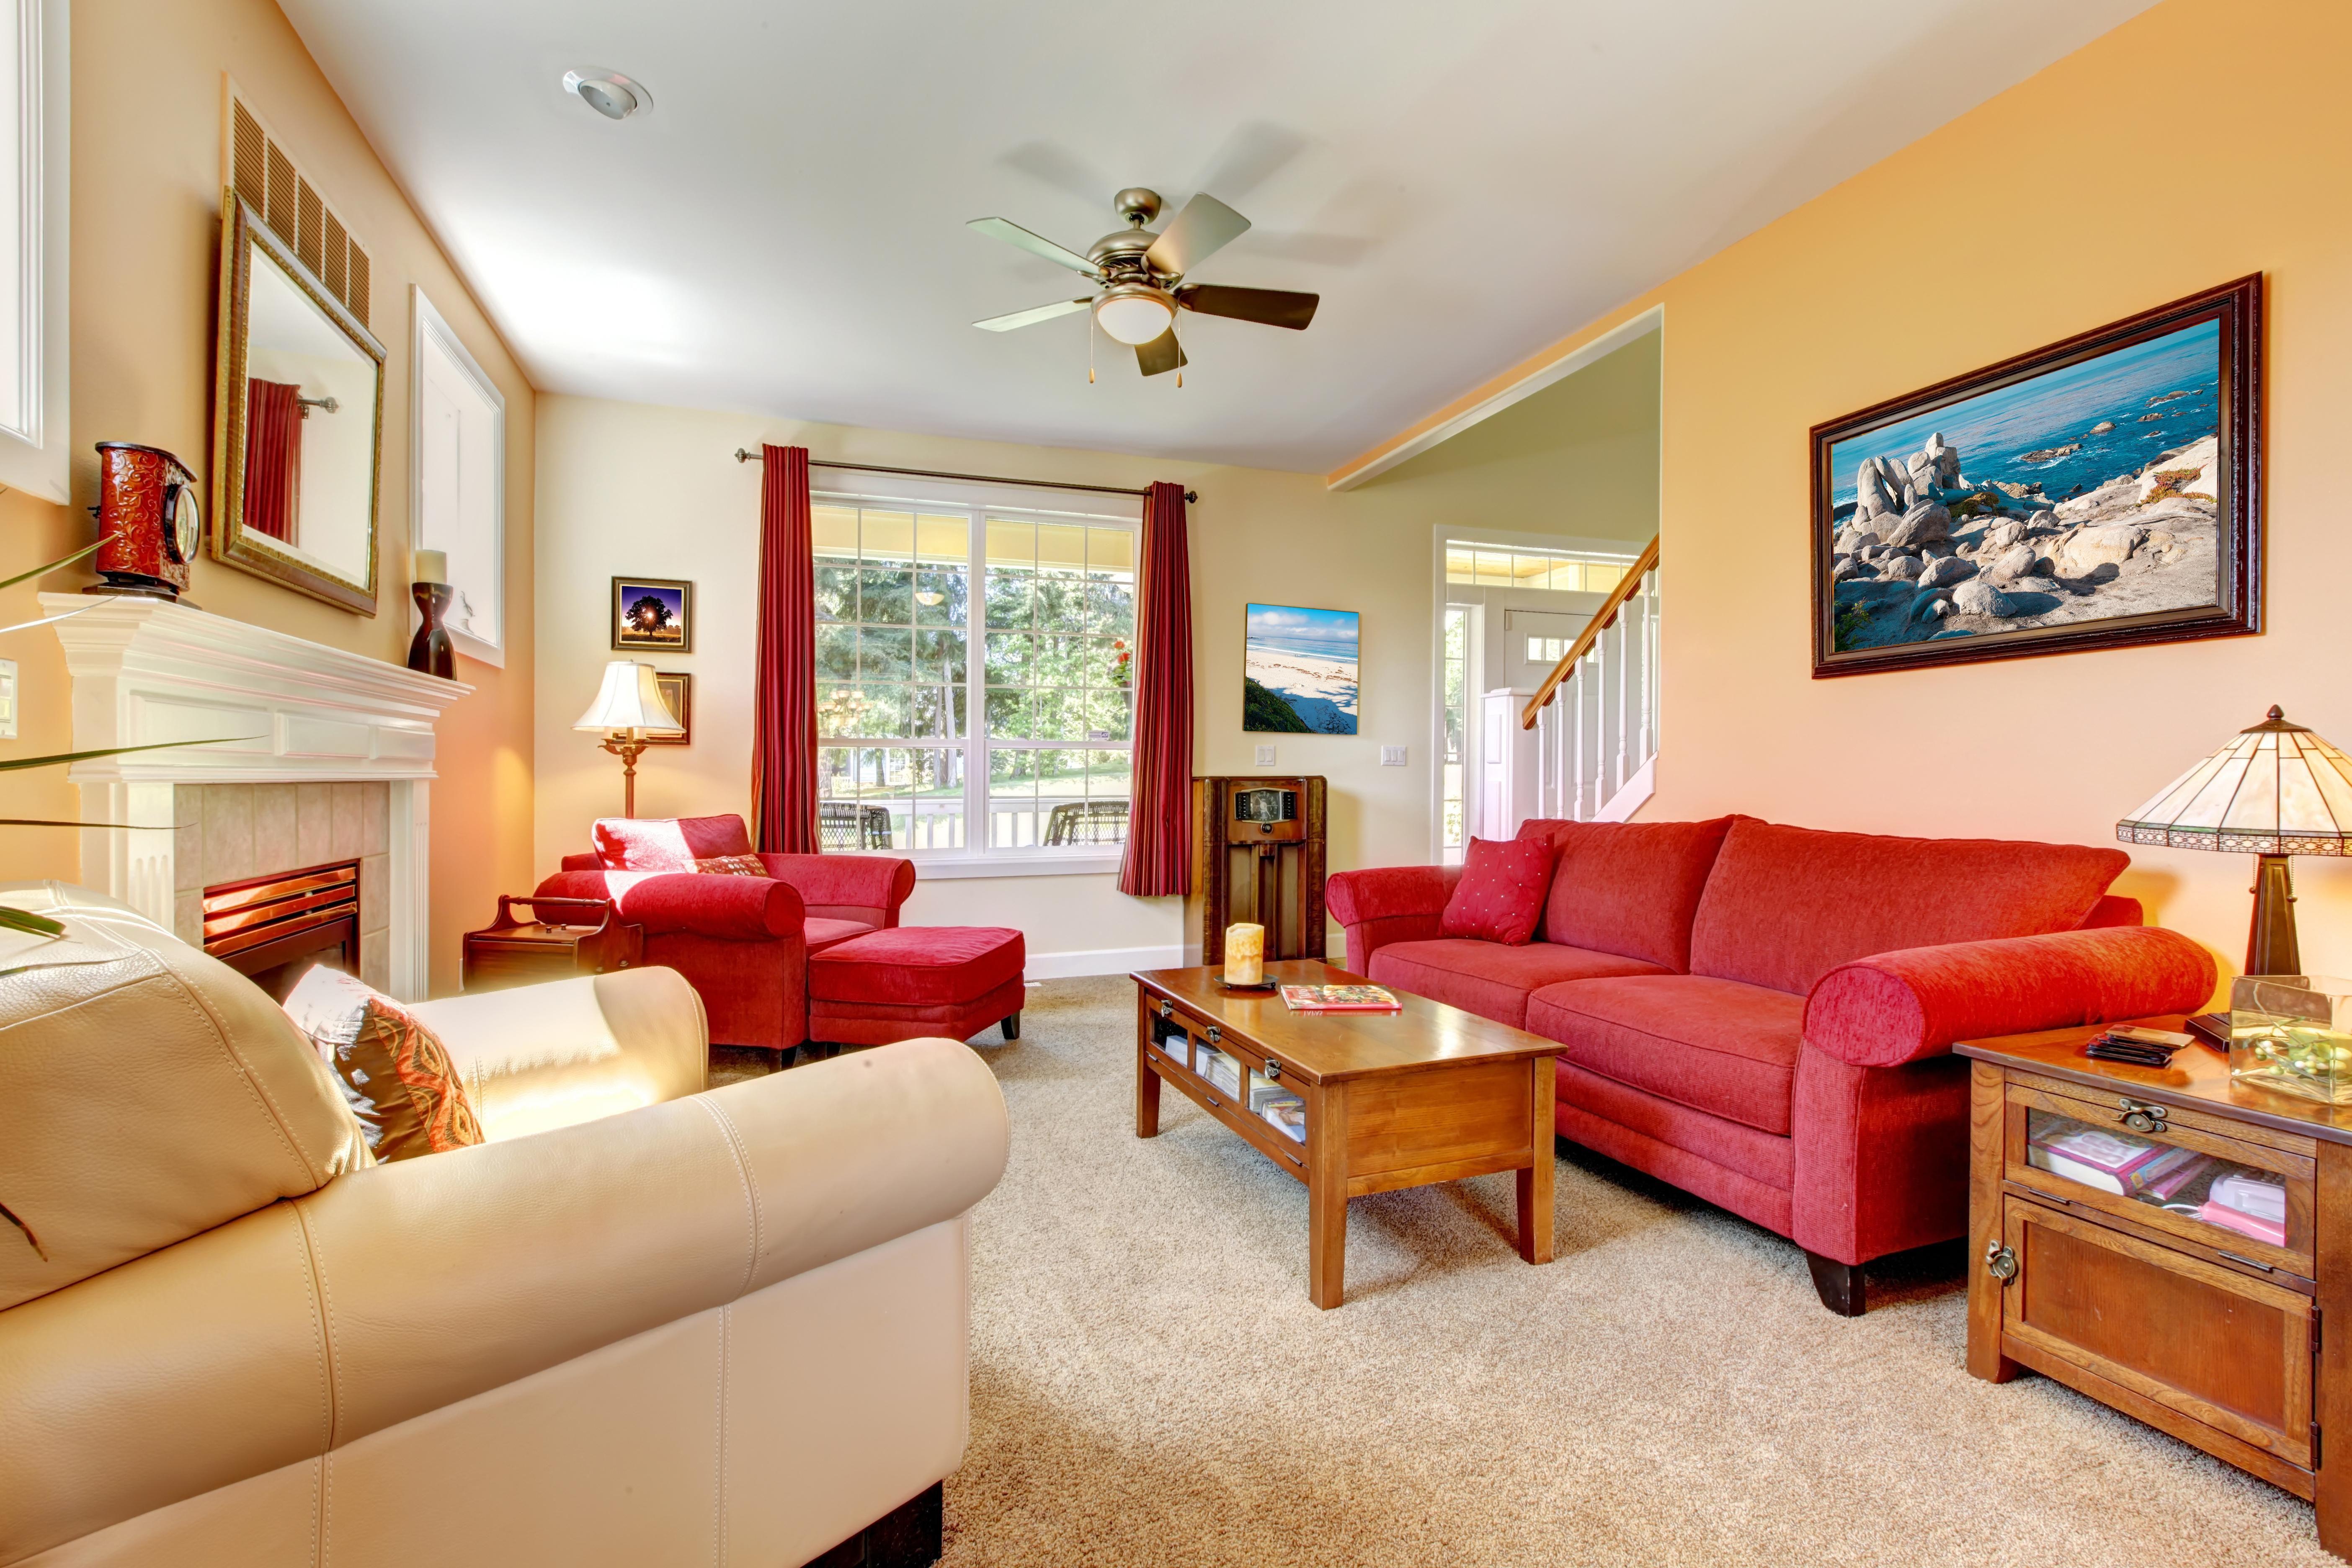 Red And Beige Living Room Decor 5616x3744 Https Ift Tt 2klq0kv Living Room Red Beige Living Rooms Peach Living Rooms #red #and #beige #living #room #ideas